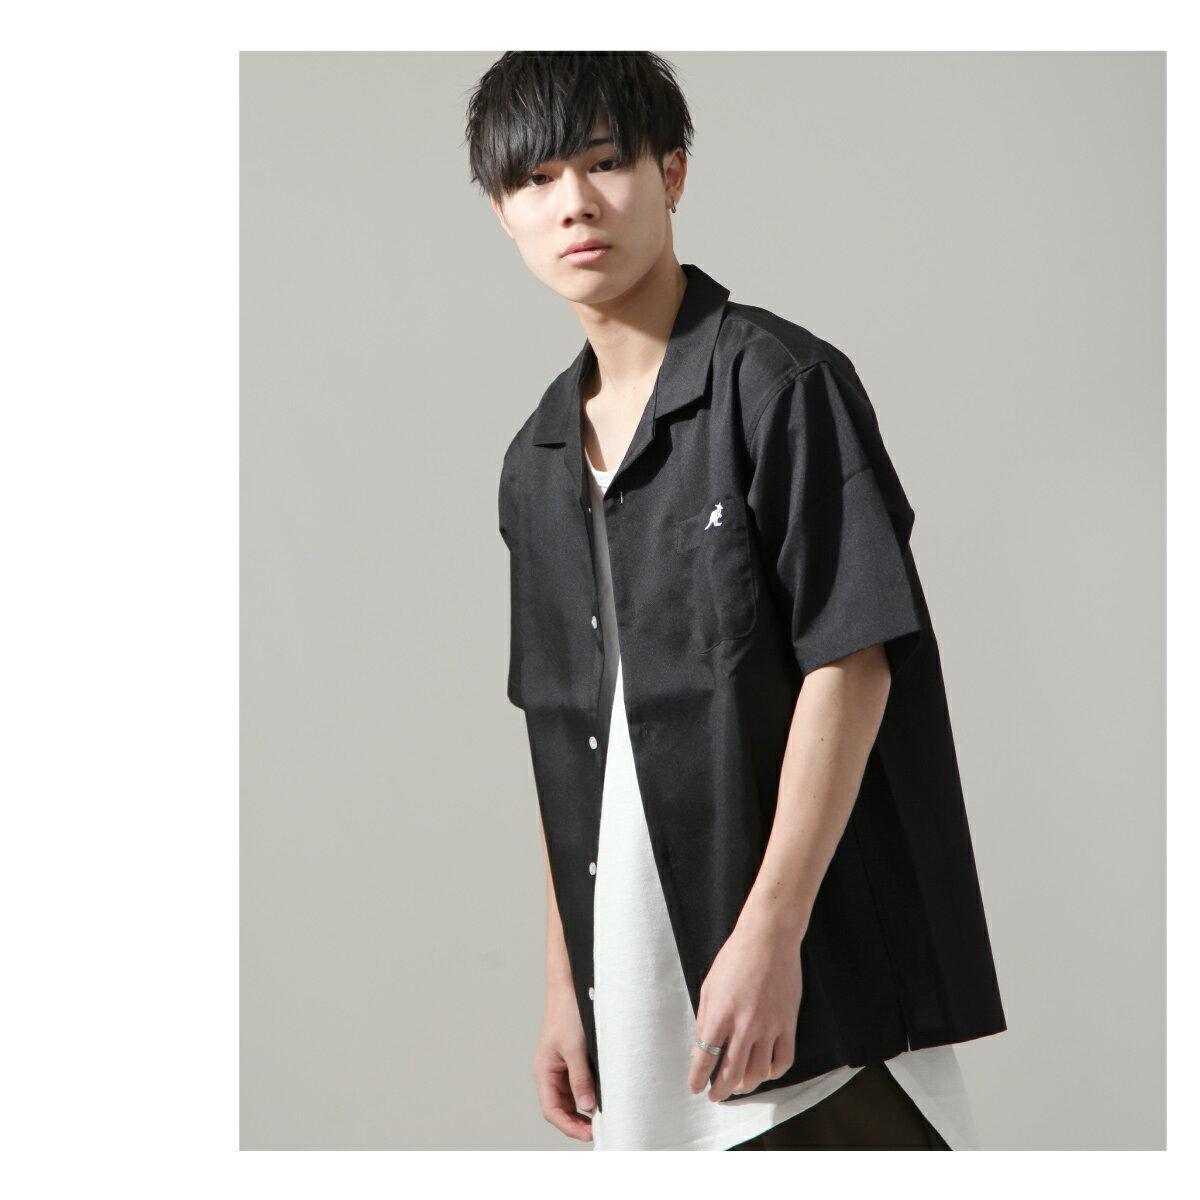 【ZIP】KANGOL短袖開領襯衫 特注款 1